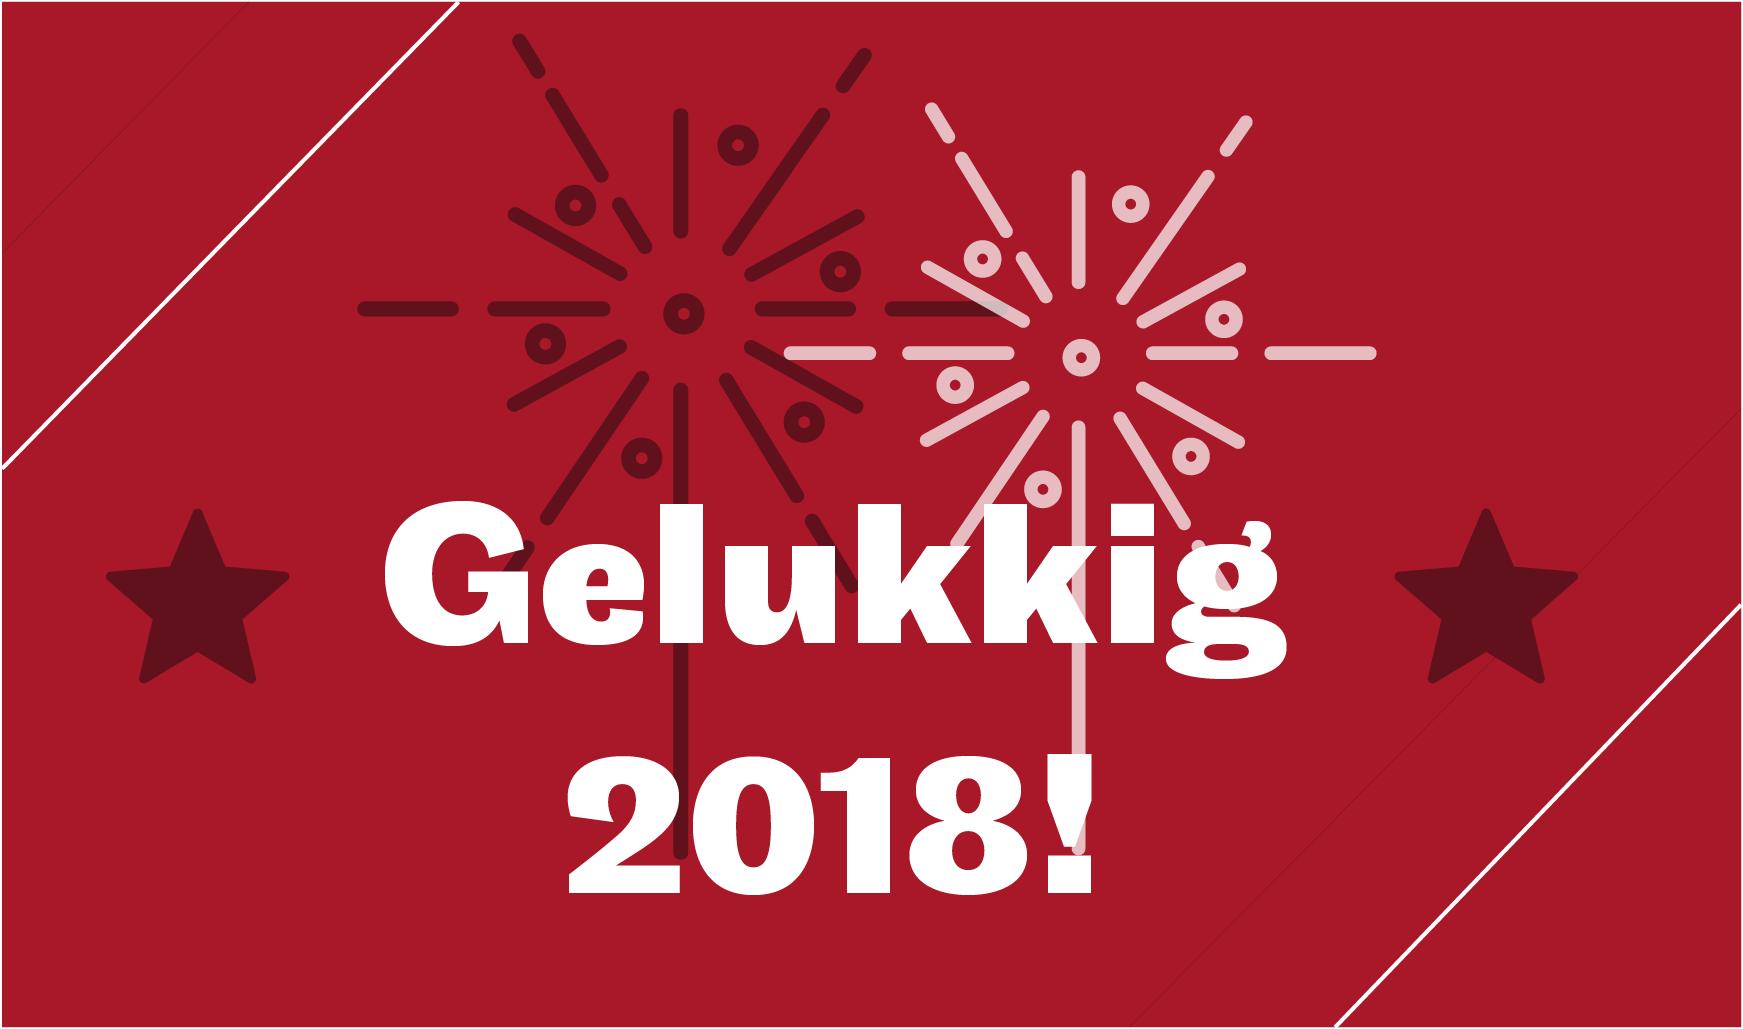 Gelukkig 2018_Gacom_communication_ security